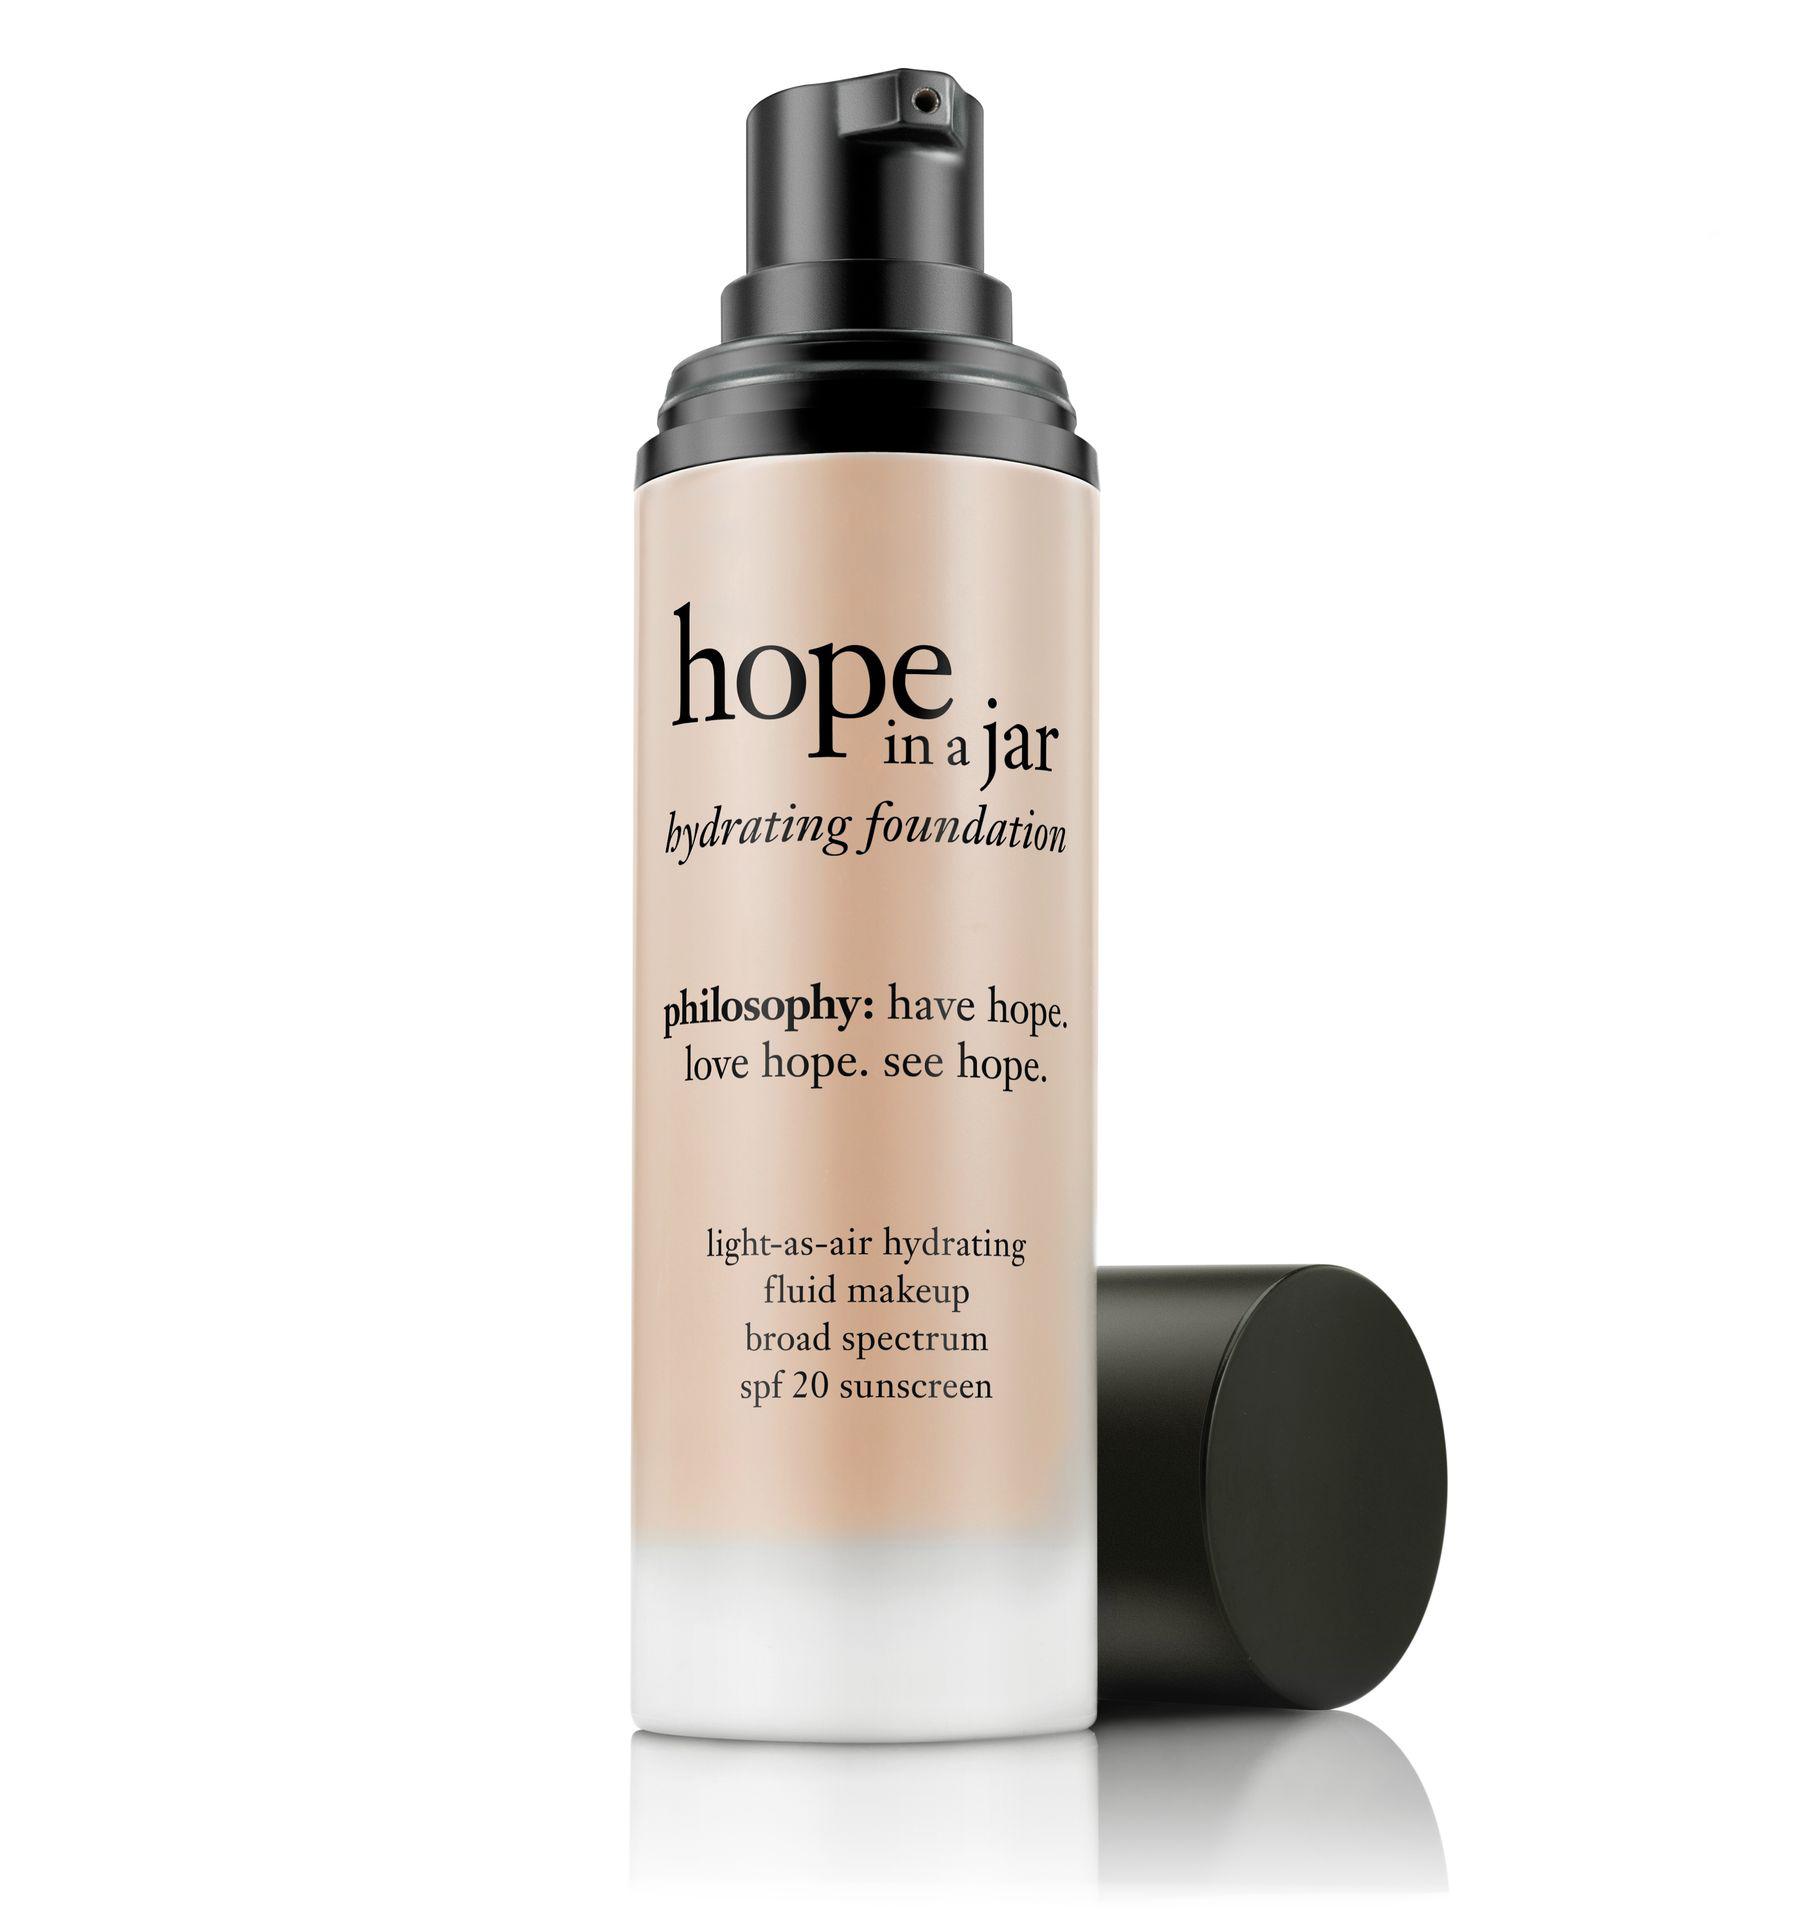 Philosophy Hope in a Jar Foundation